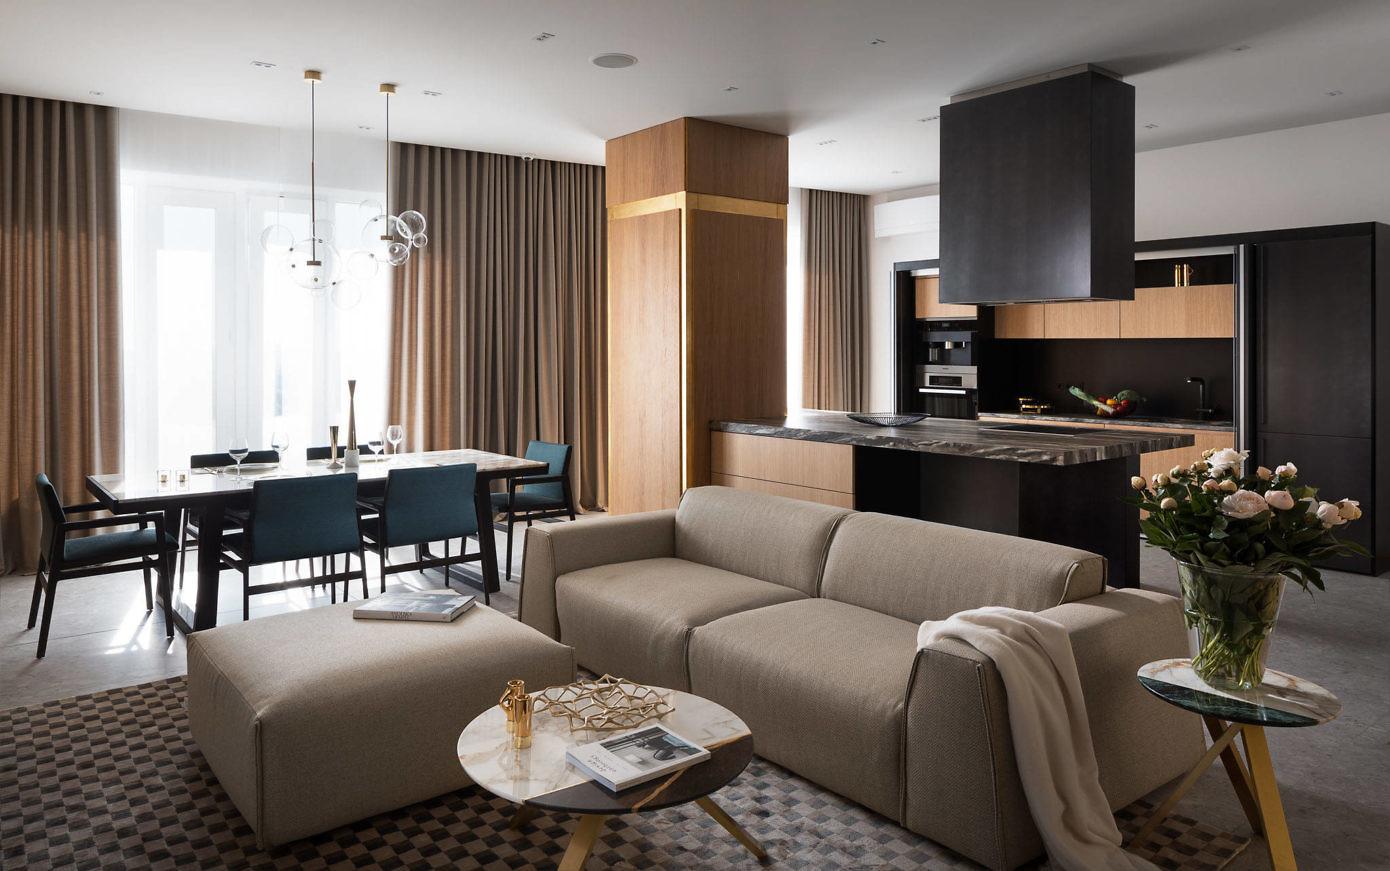 Apartment in Ukraine by Design Studio Zimenko Yuriy